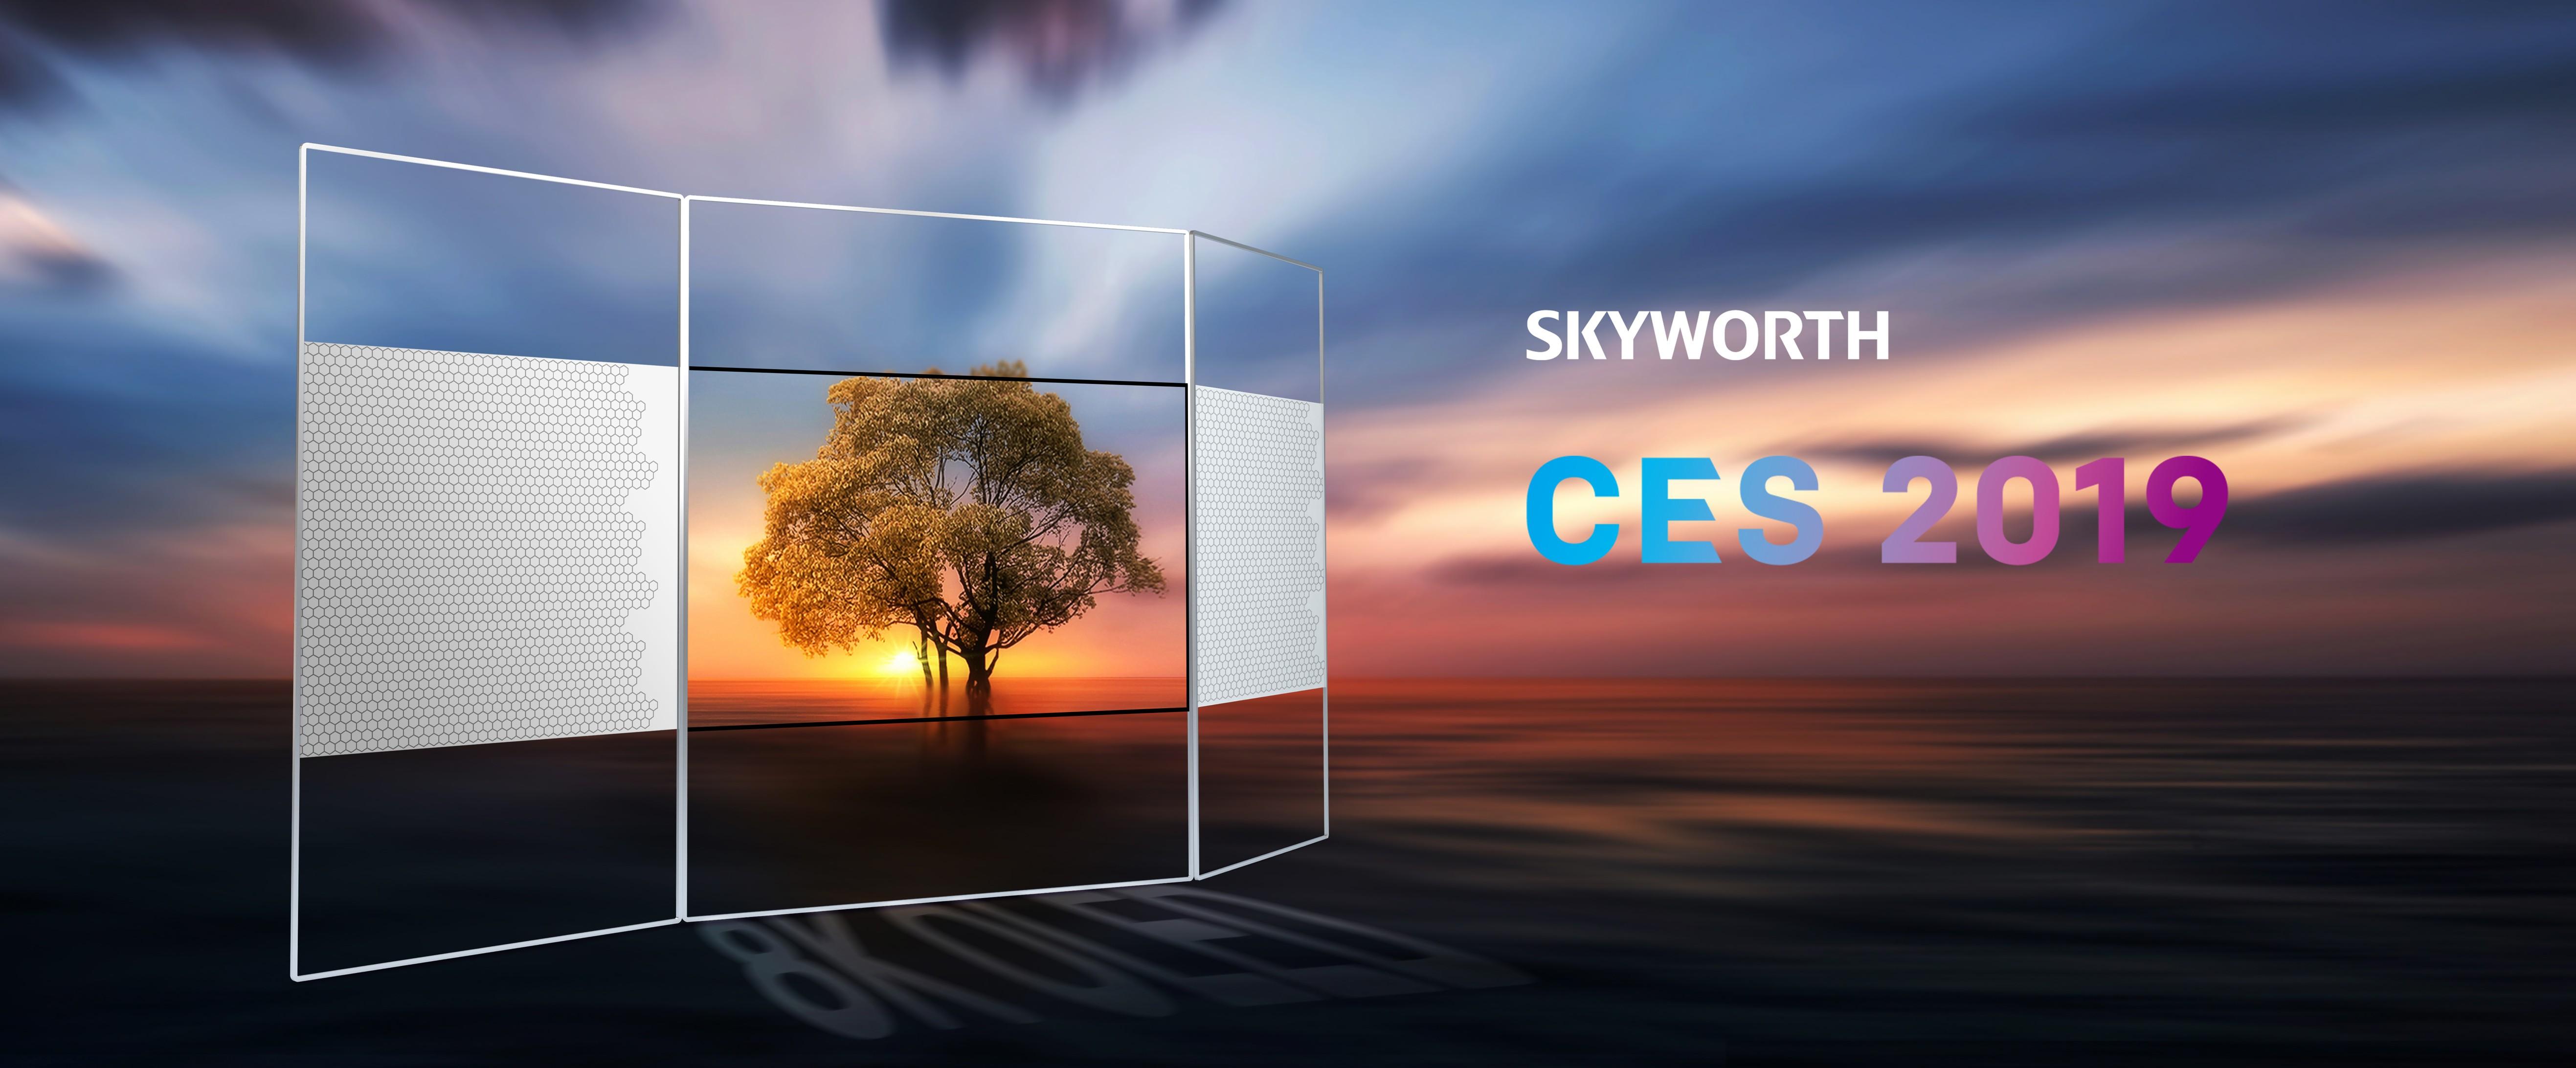 Skyworth India Electronics Pvt Ltd | LinkedIn